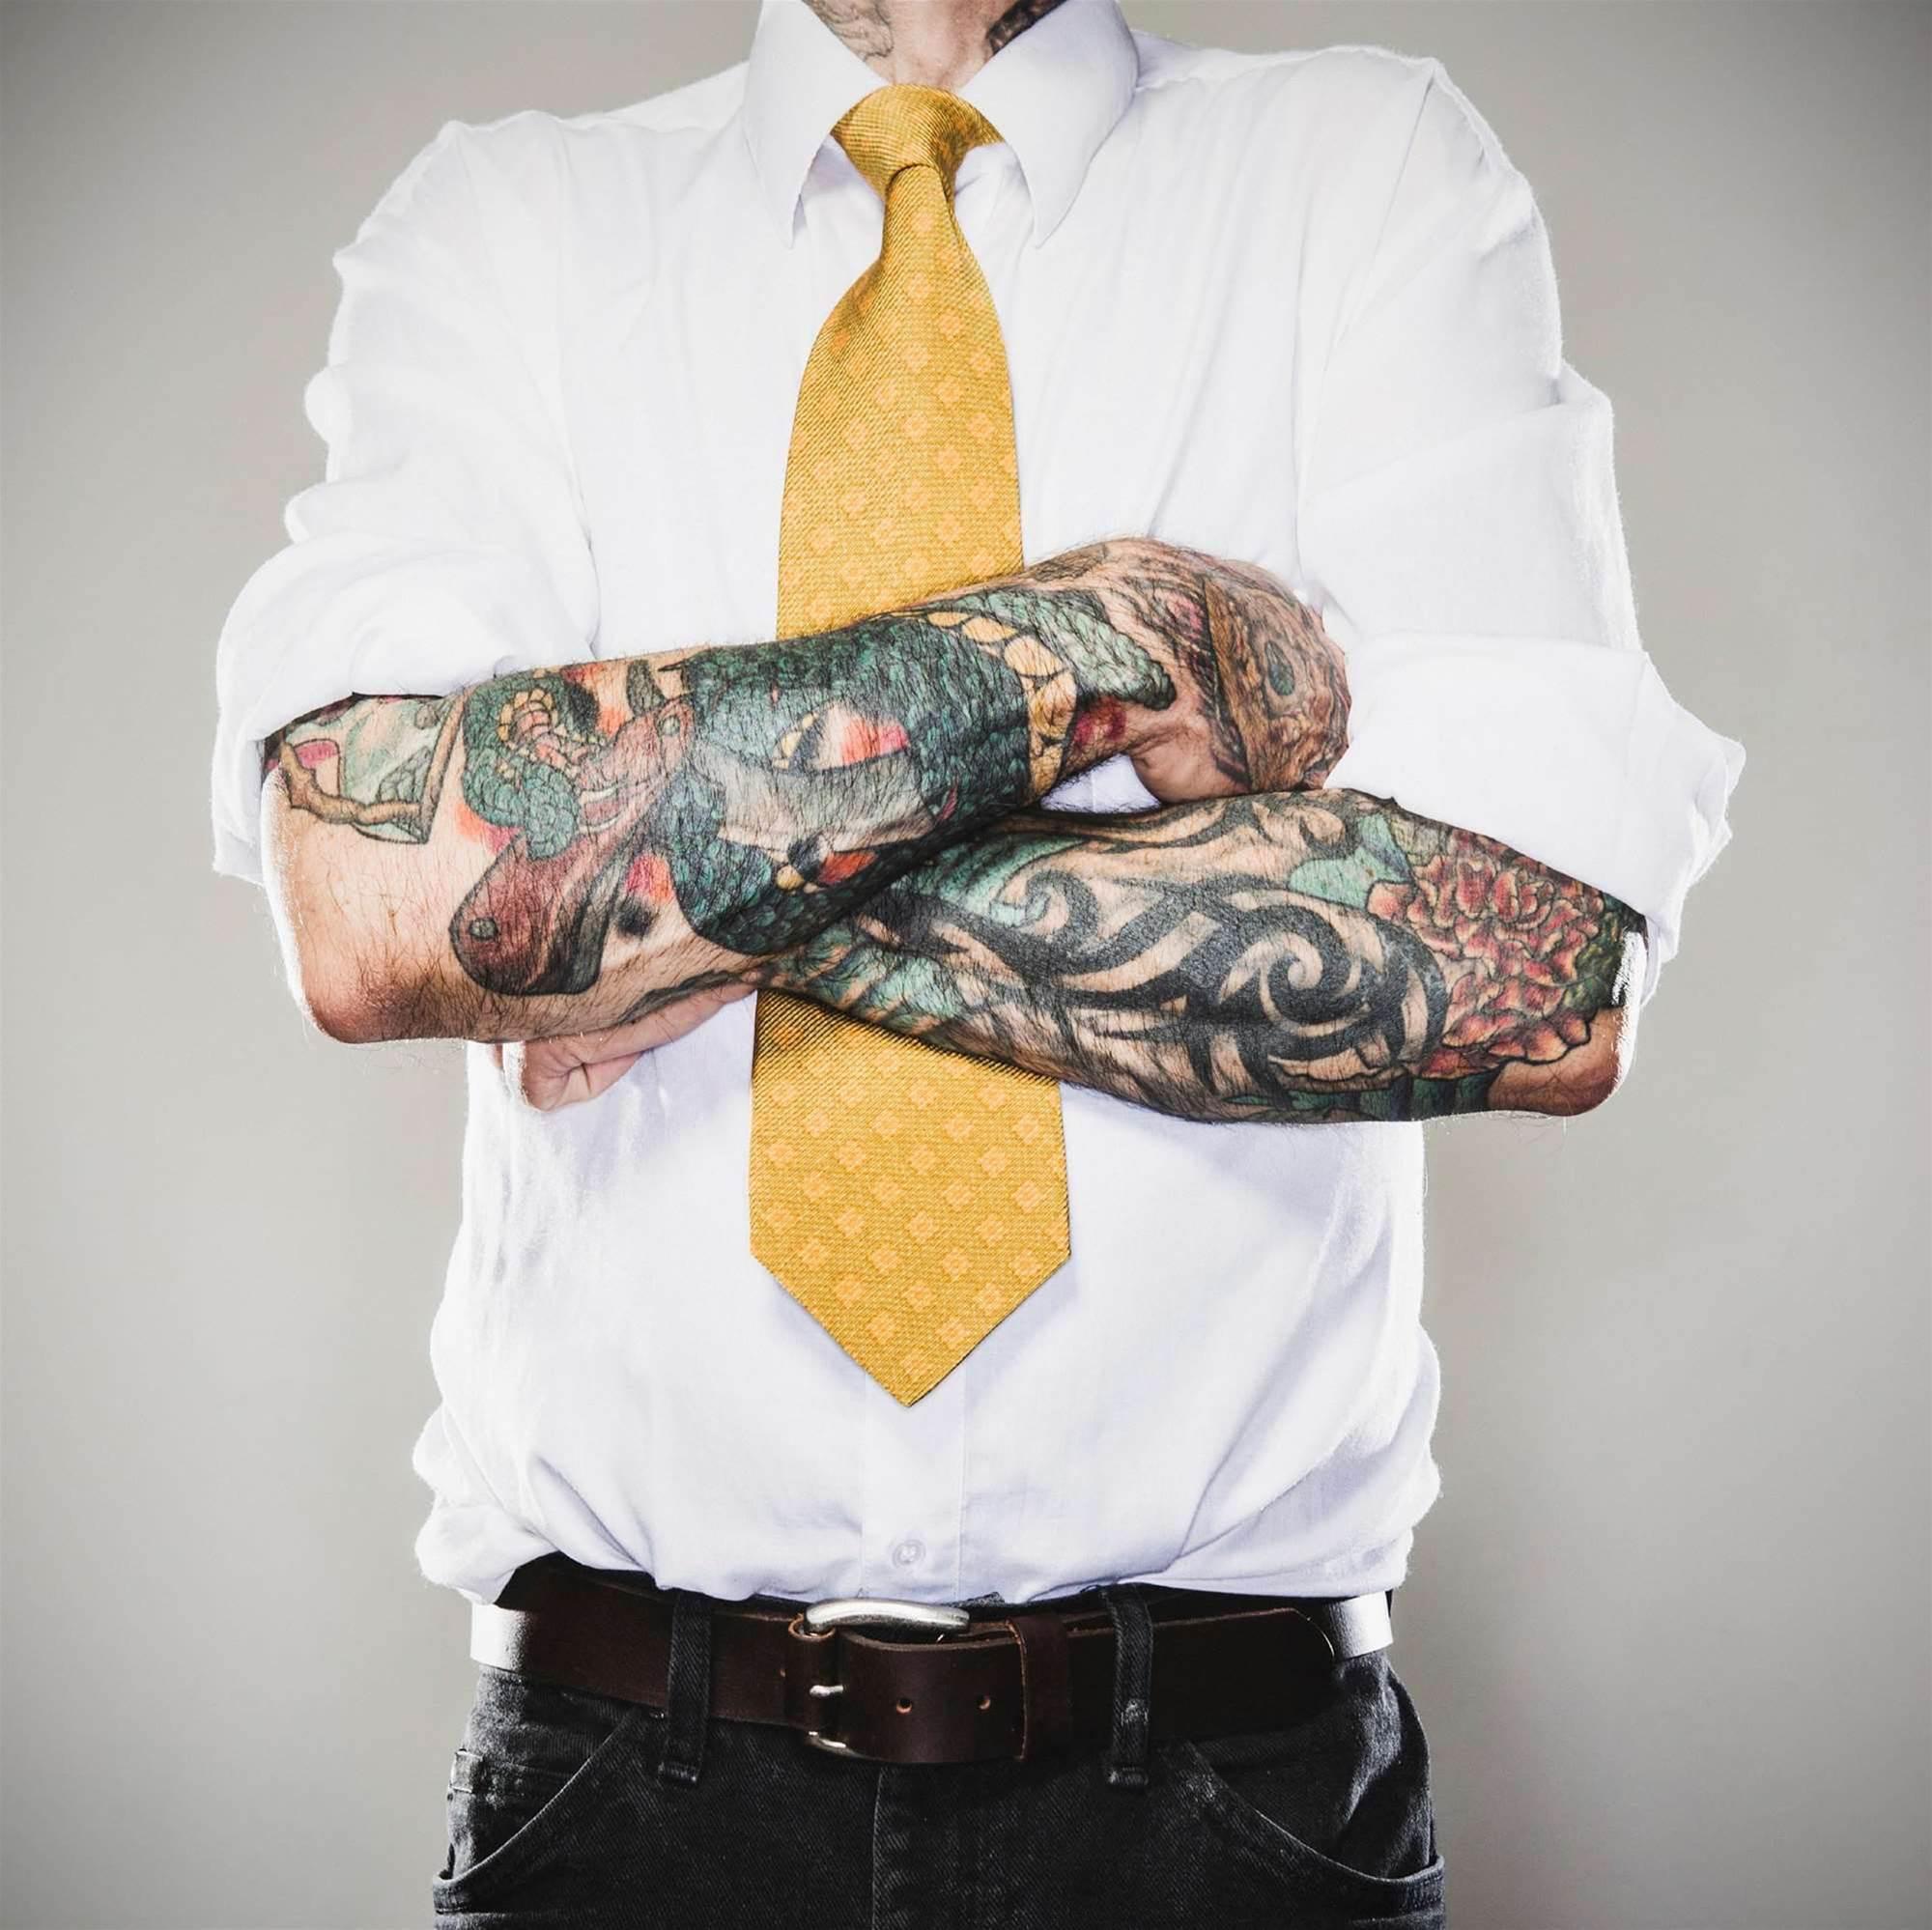 NIST tests biometrics algorithms for tattoo-matching database